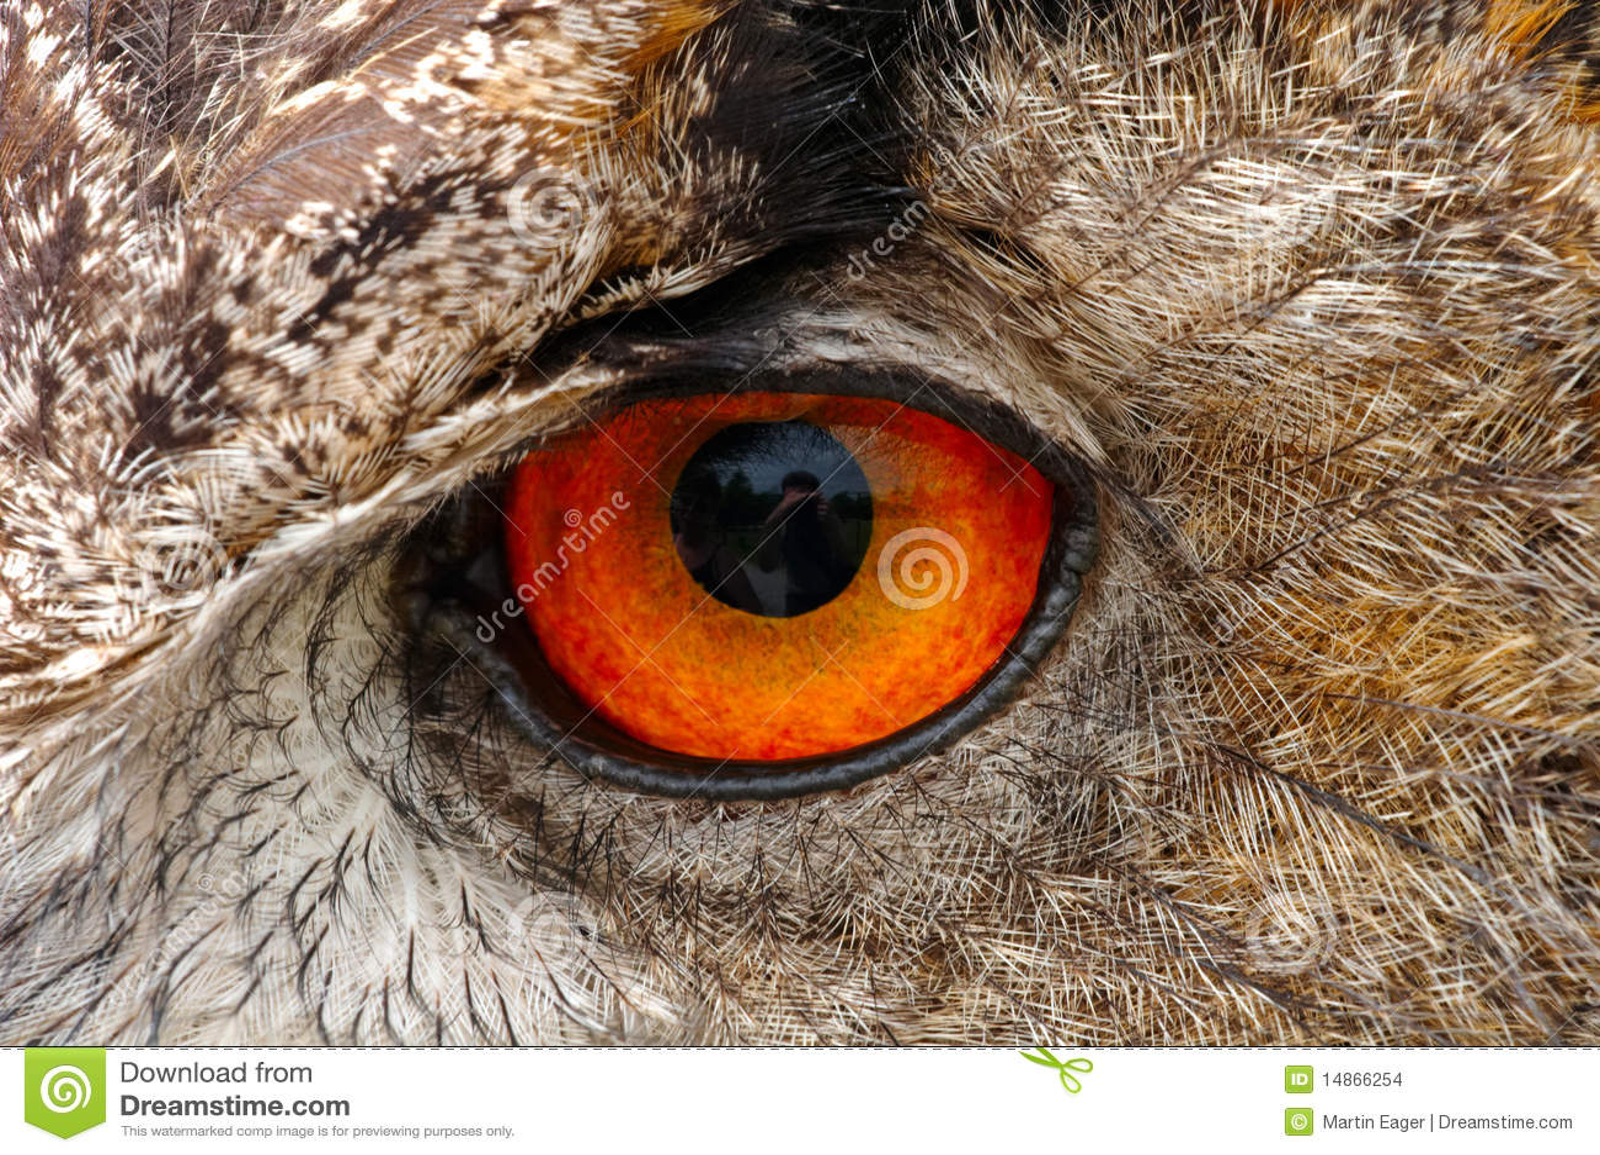 European Eagle Owl Eye Closeup